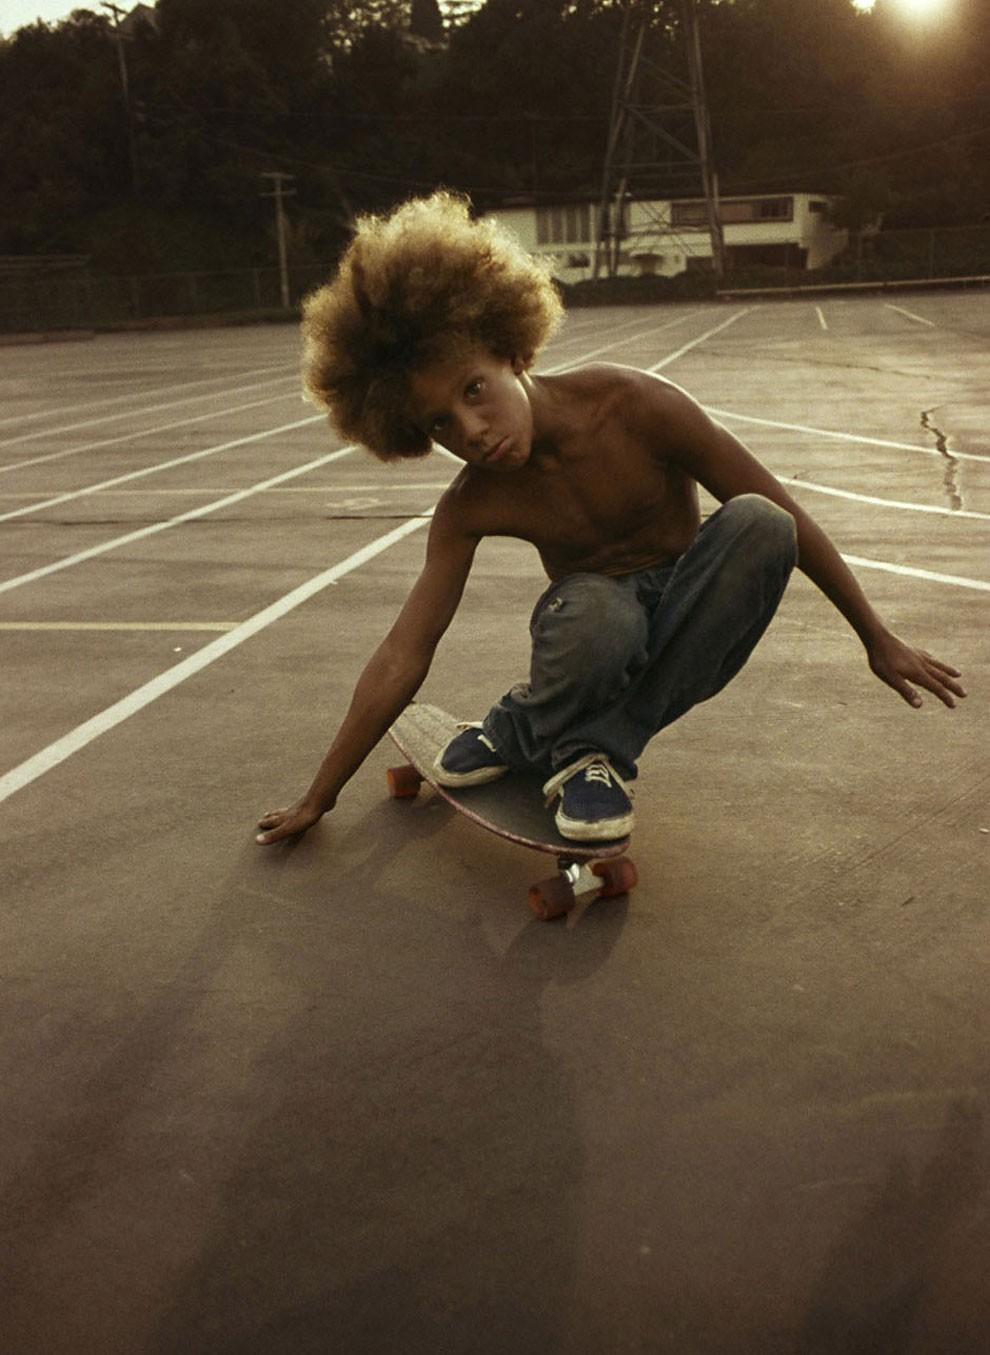 fotografia-skateboard-cultura-usa-anni-70-libro-hugh-holland-09